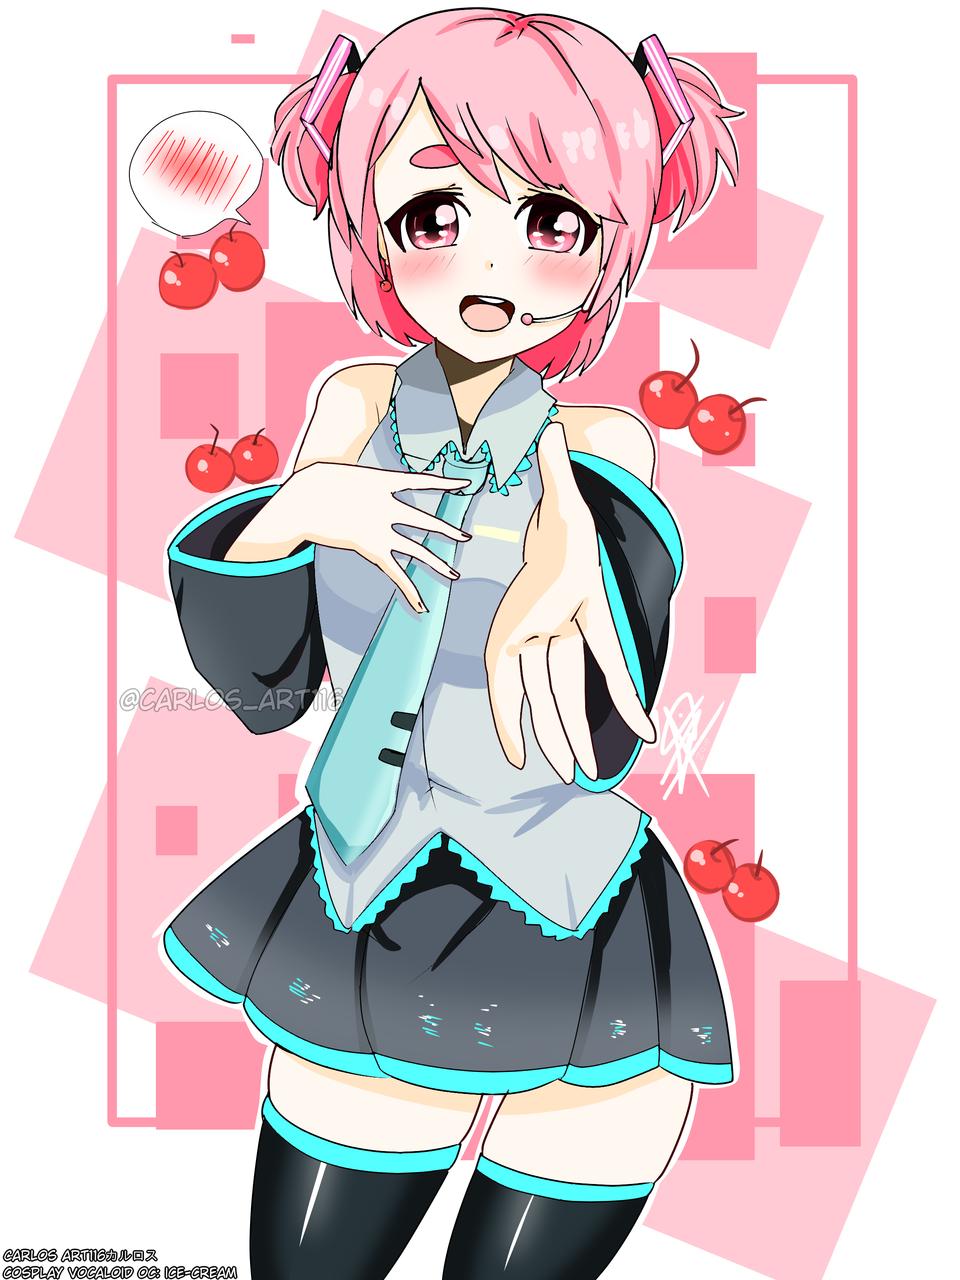 oc:ice-cream: cosplay de Hatsune Miku ( ꈍᴗꈍ)